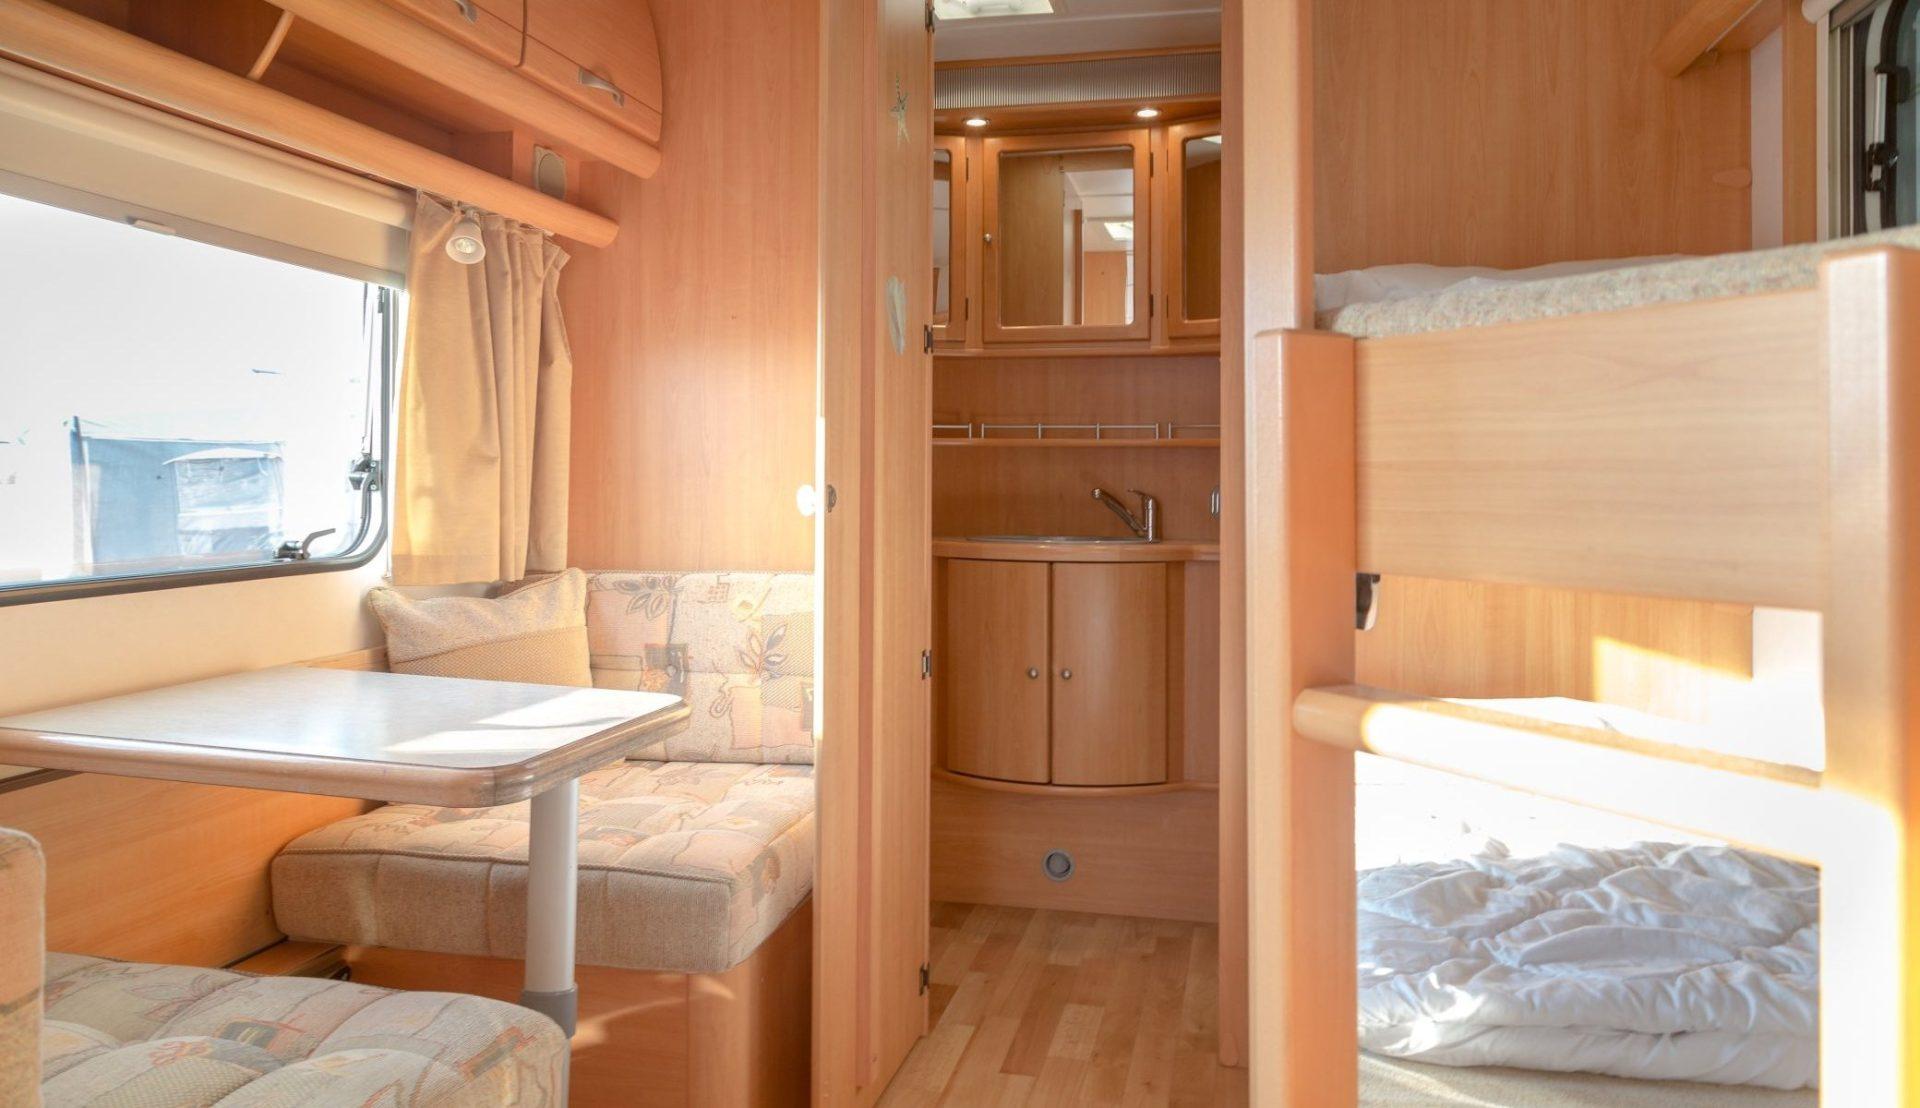 Kinder Etagenbett Camping : Westerland u2022 camping sylt